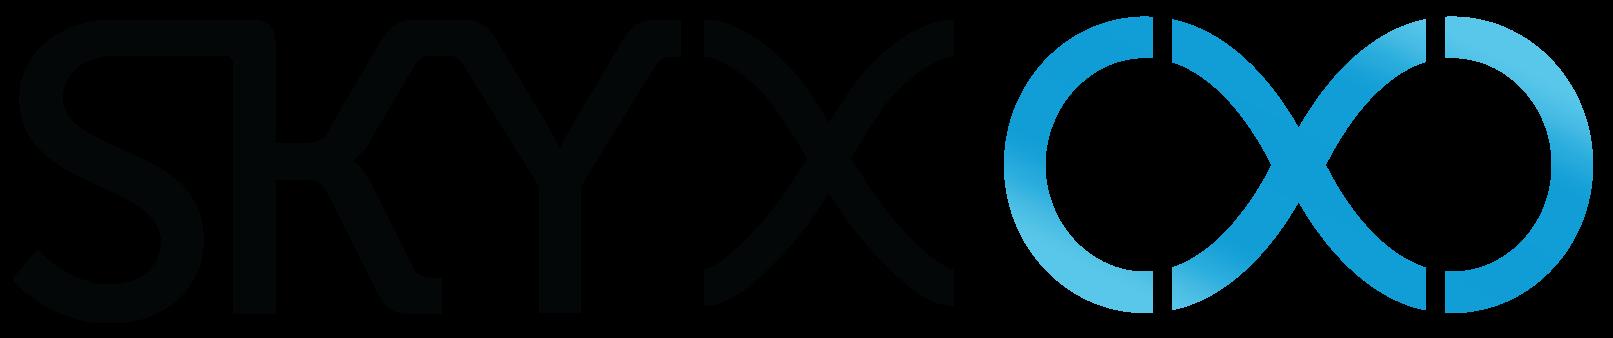 SkyX_logo_final.png